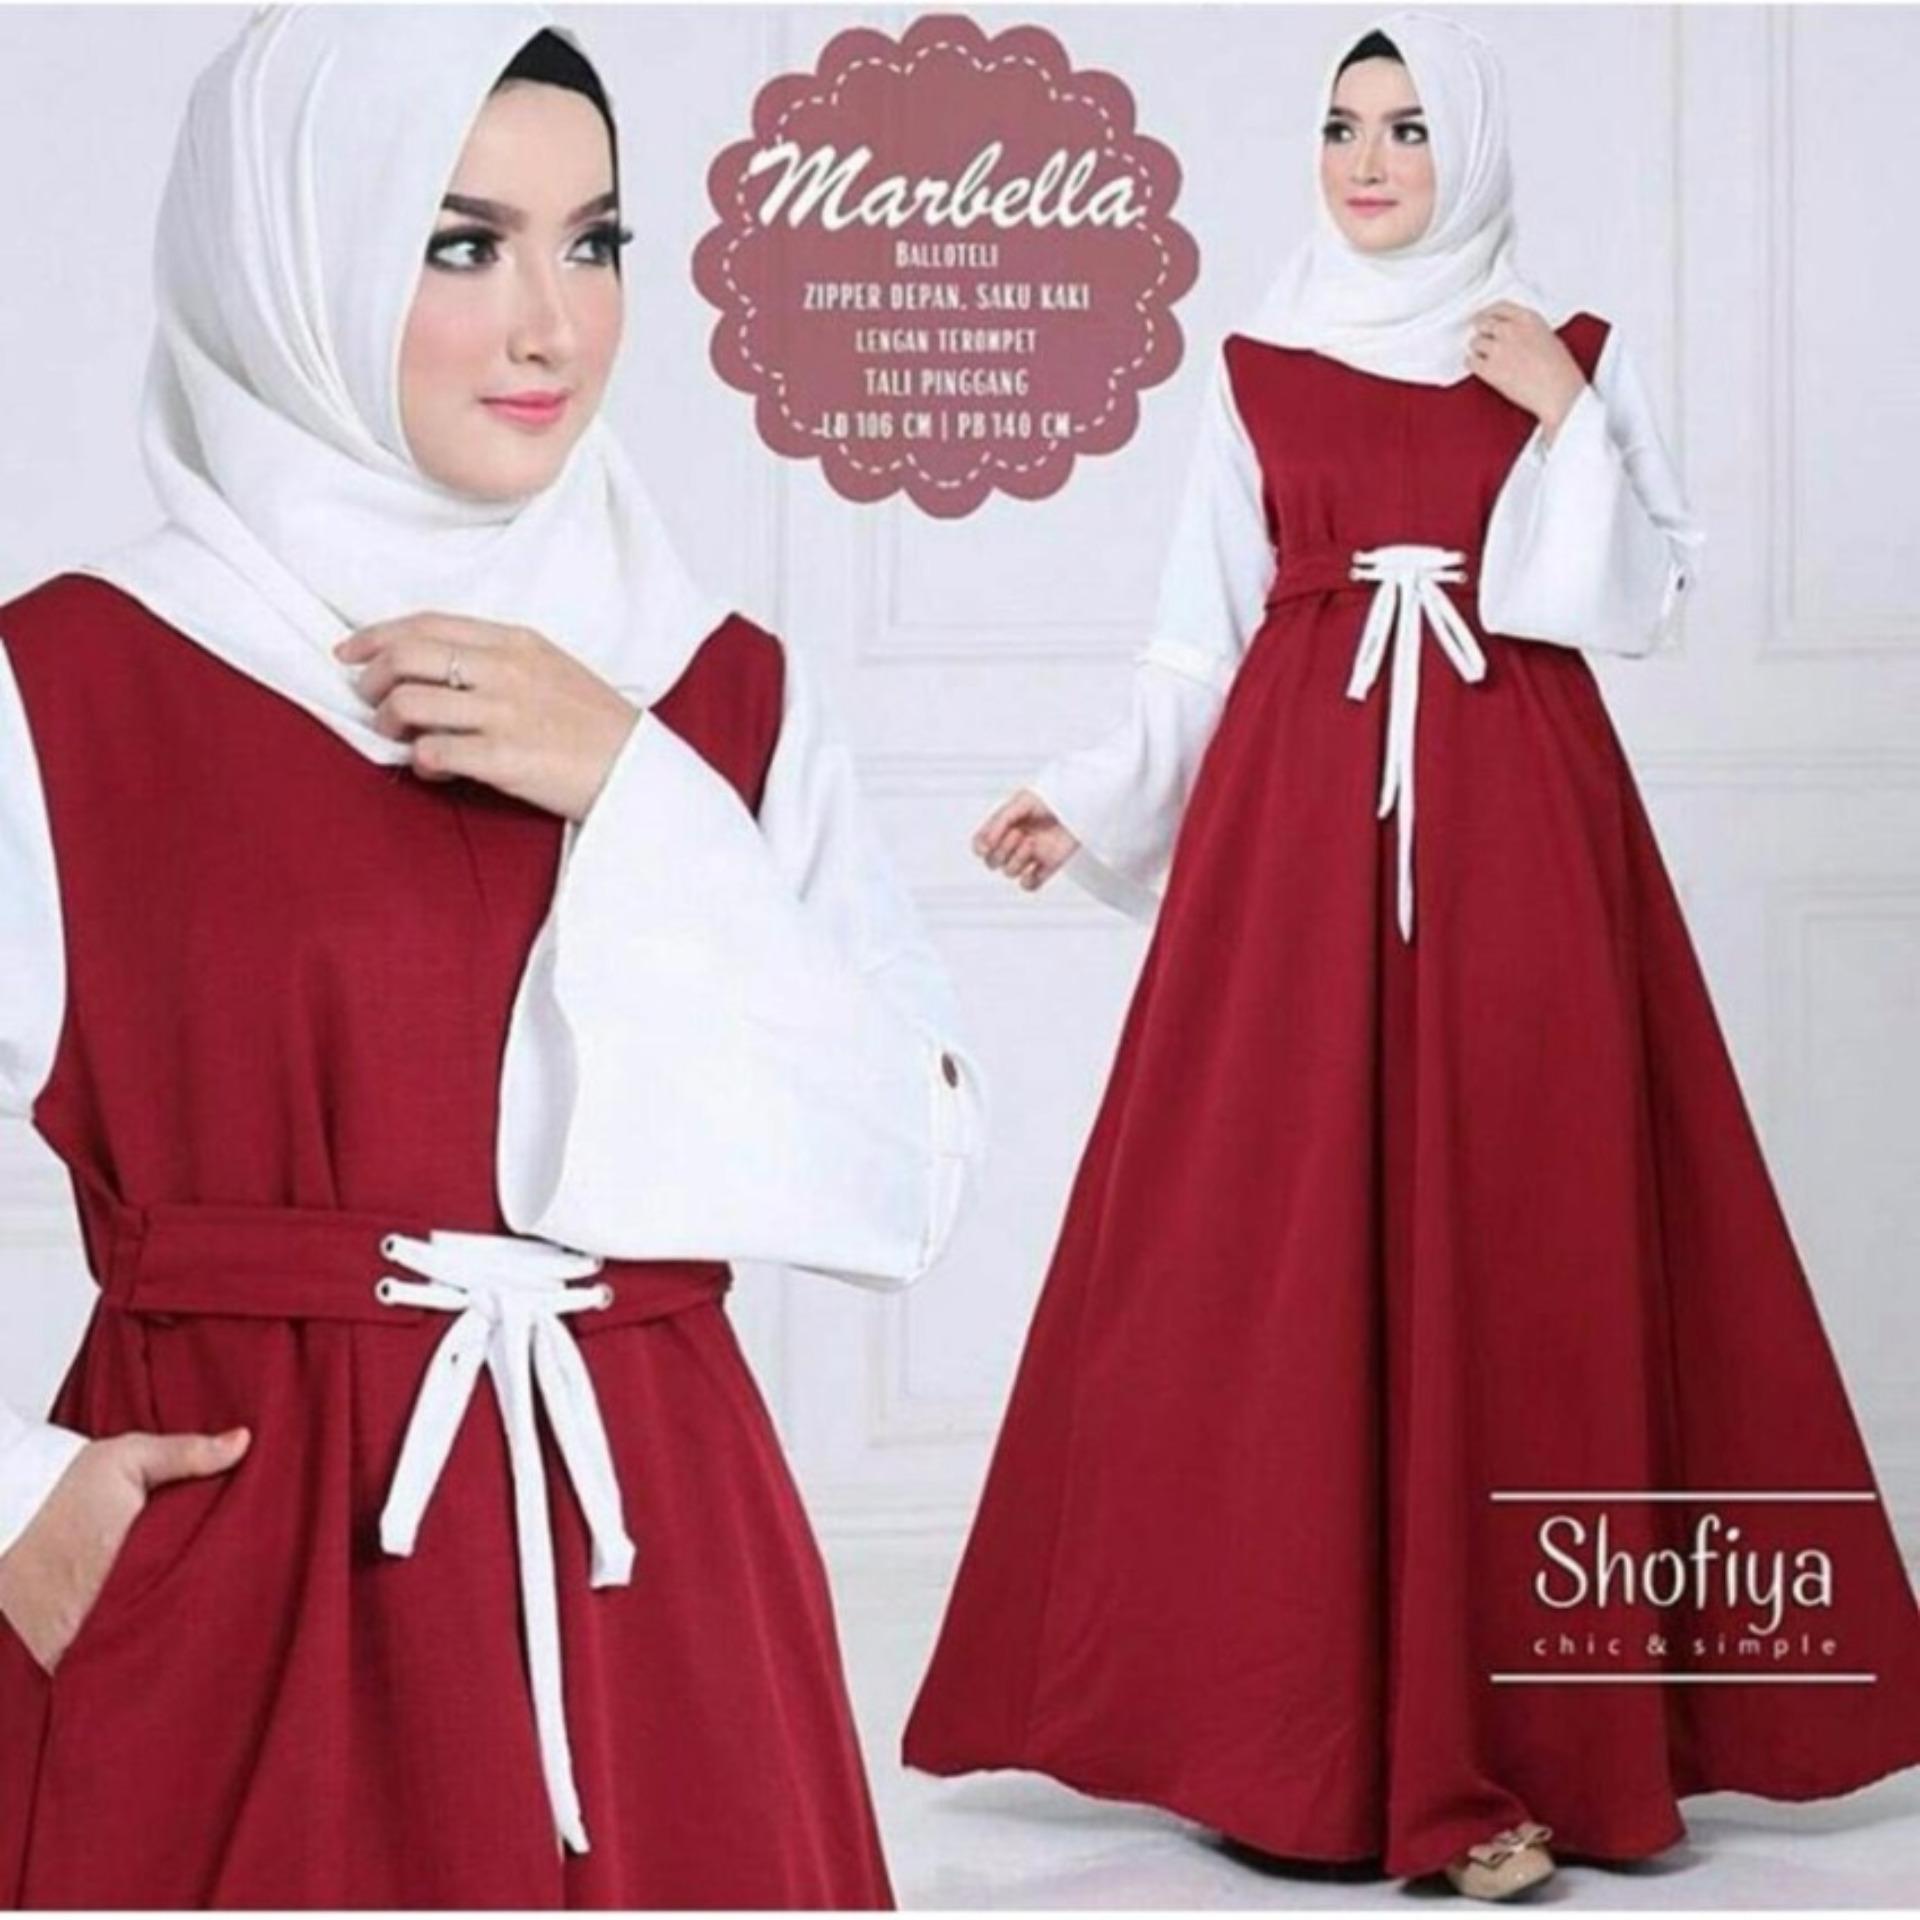 Baju Muslim Baju Gamis Marbella Dress Wolfis Gamis Panjang Hijab Casual Pakaian  Wanita Hijab Modern 93974837a0